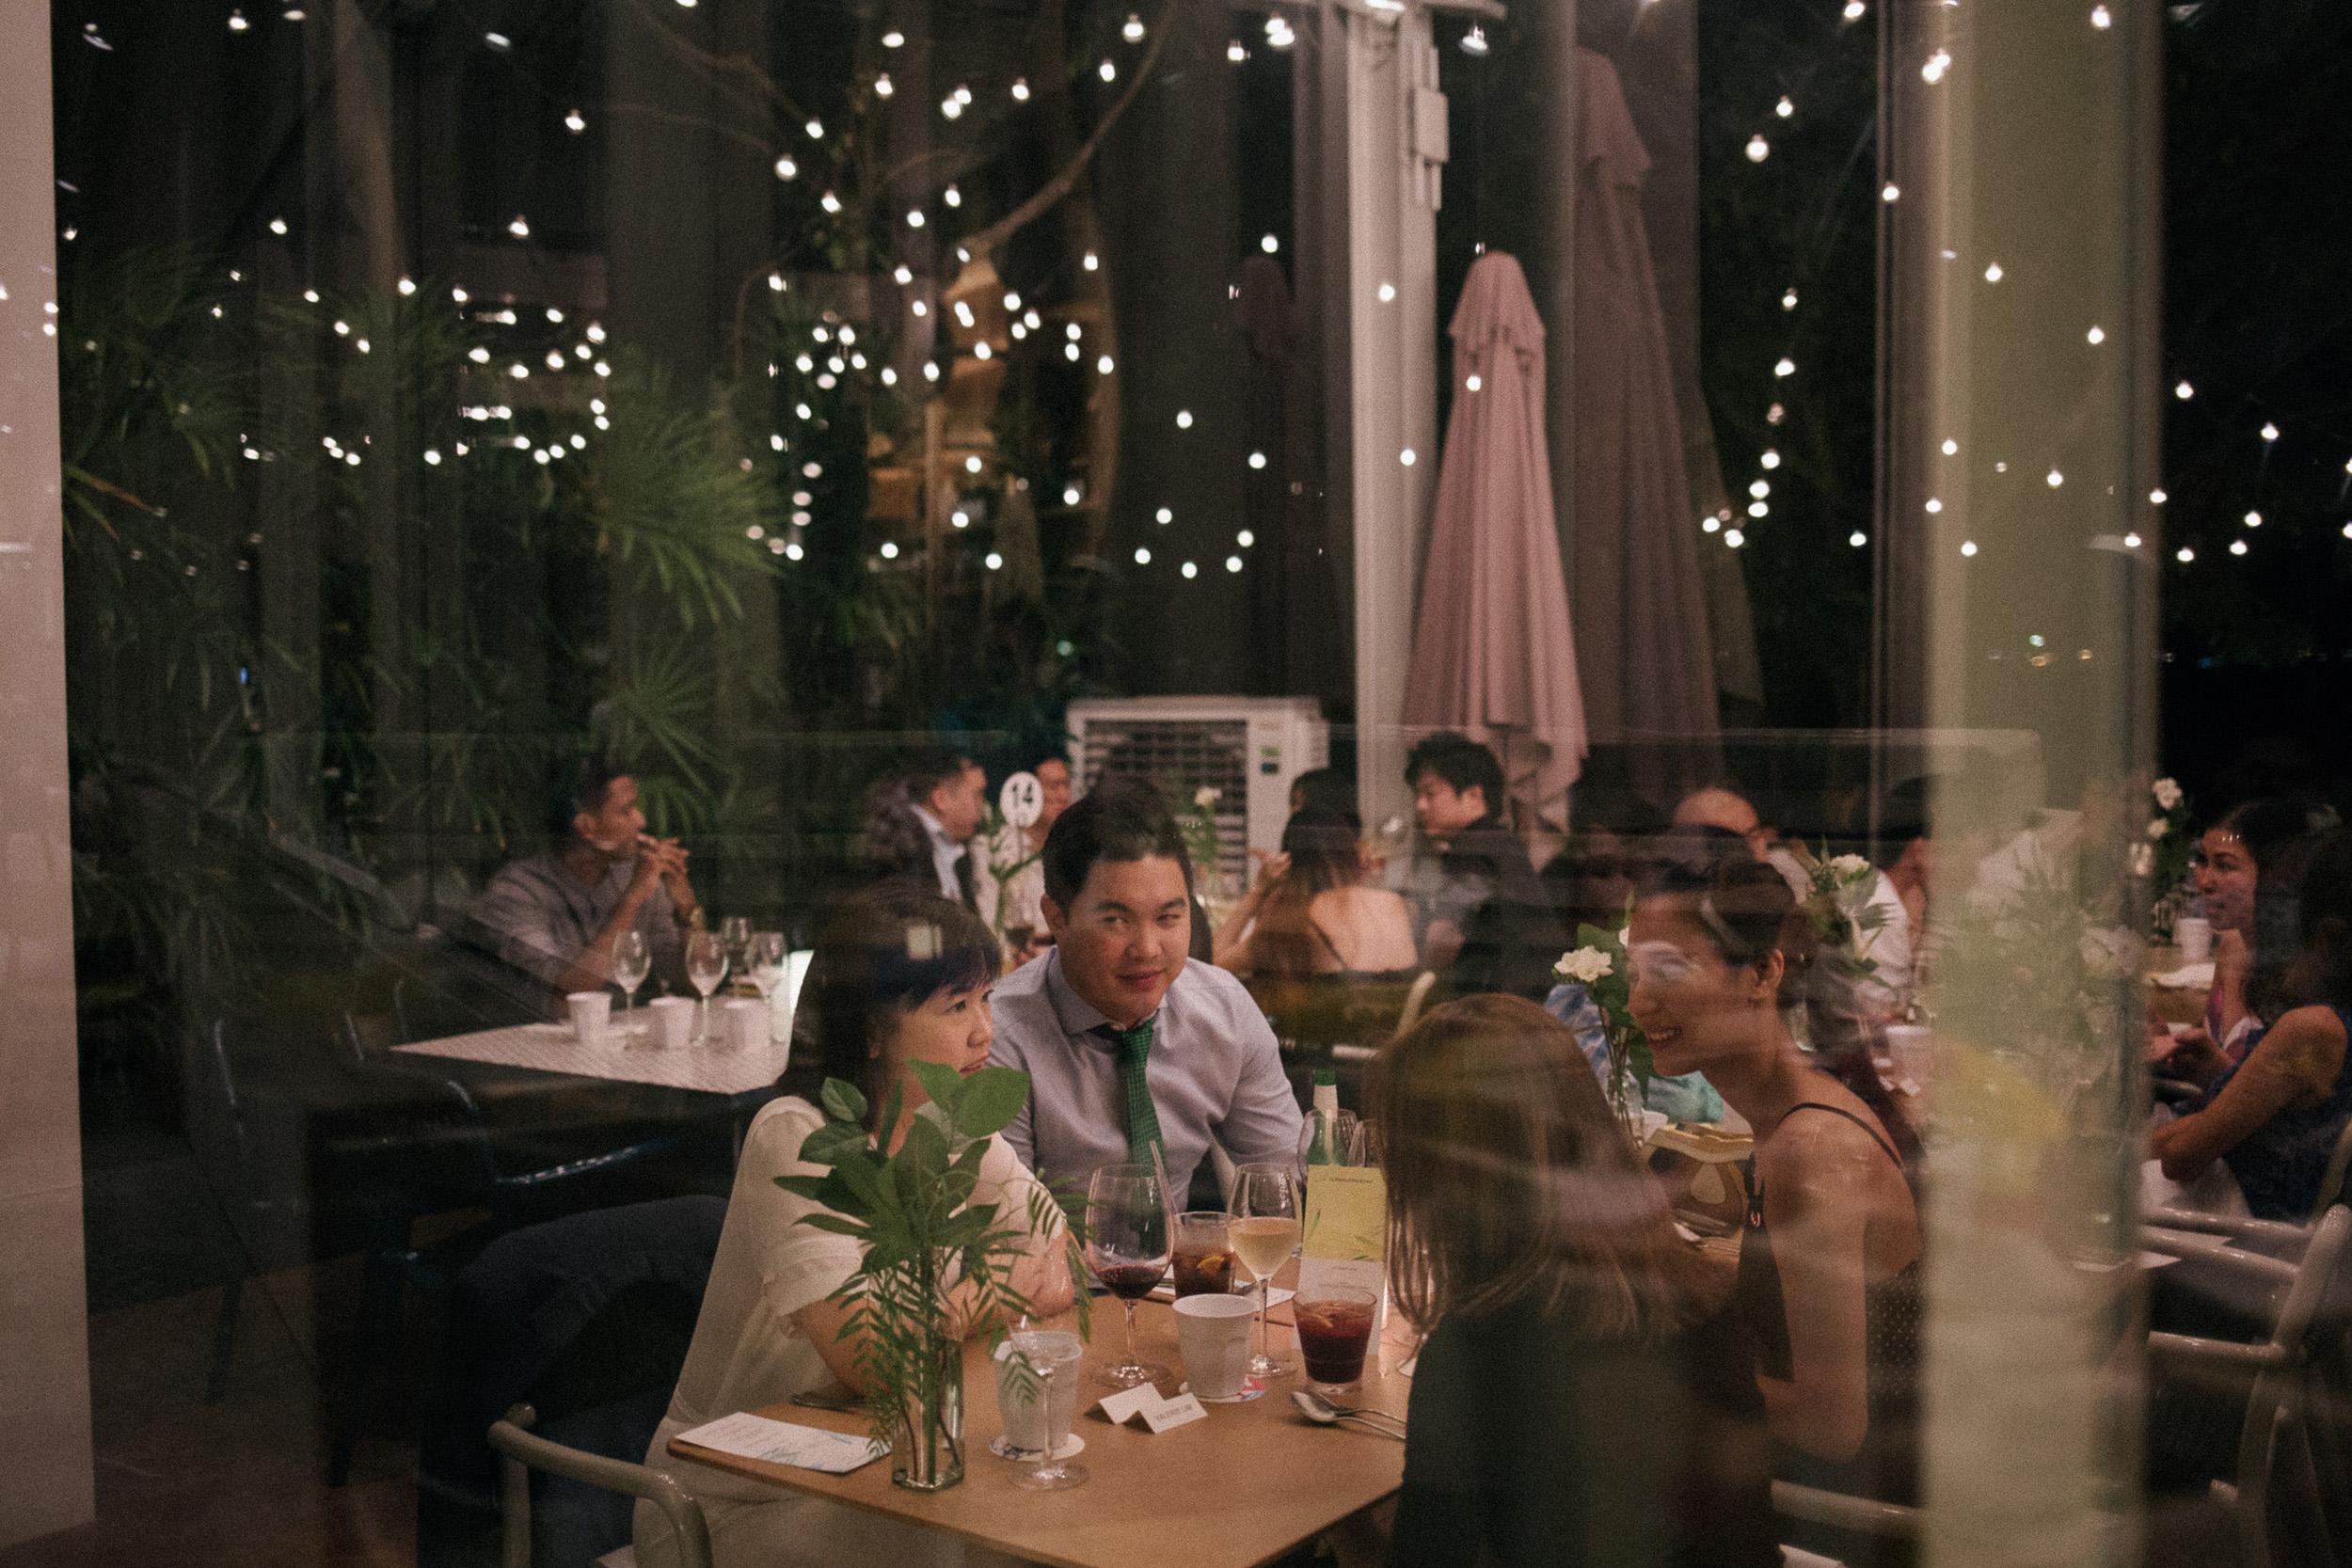 singapore-wedding-photographer-photography-wmt2017-061.jpg